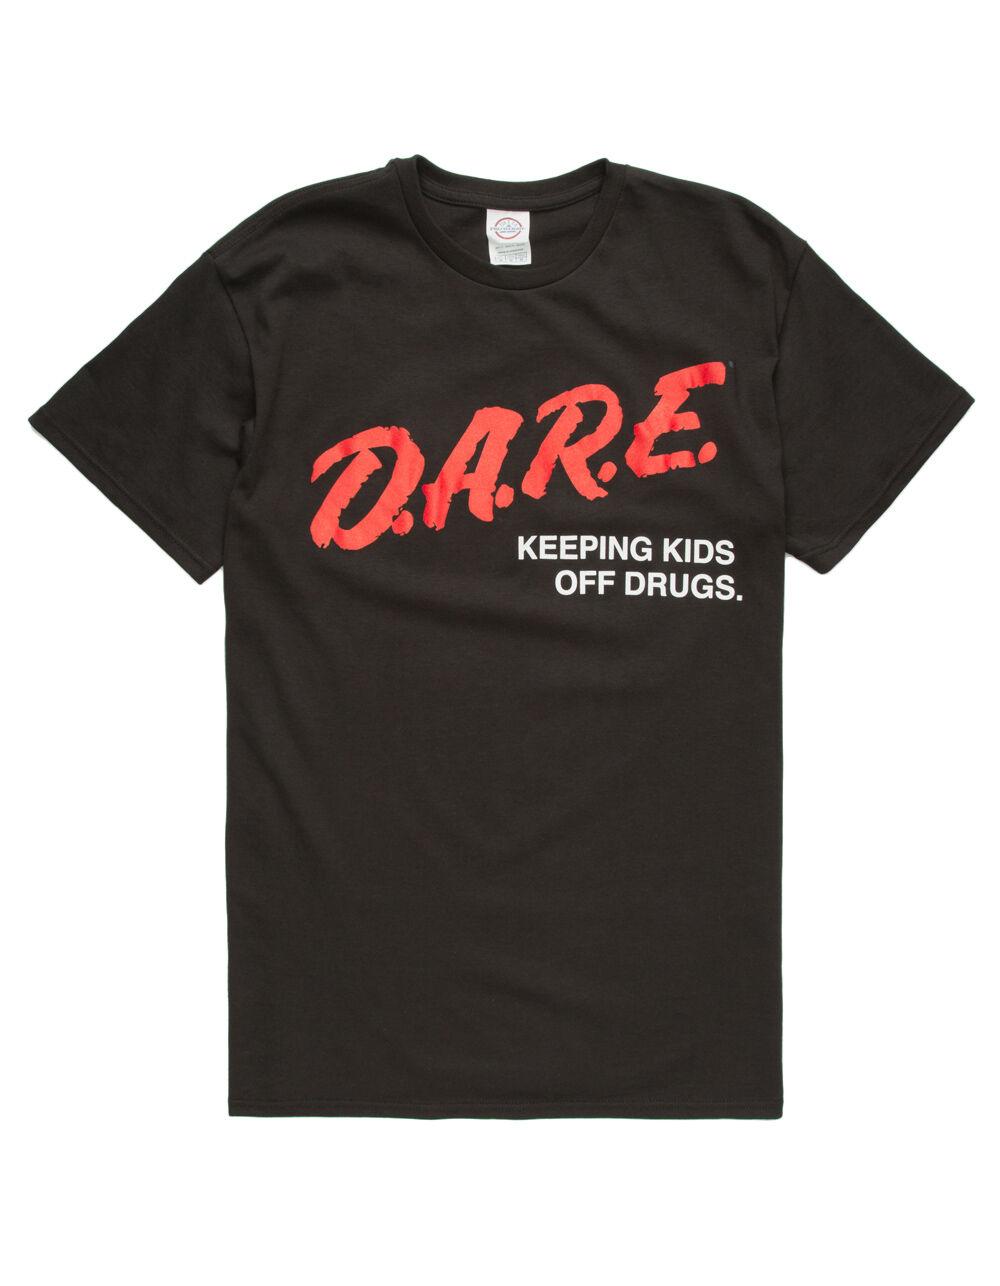 Image of DARE T-SHIRT